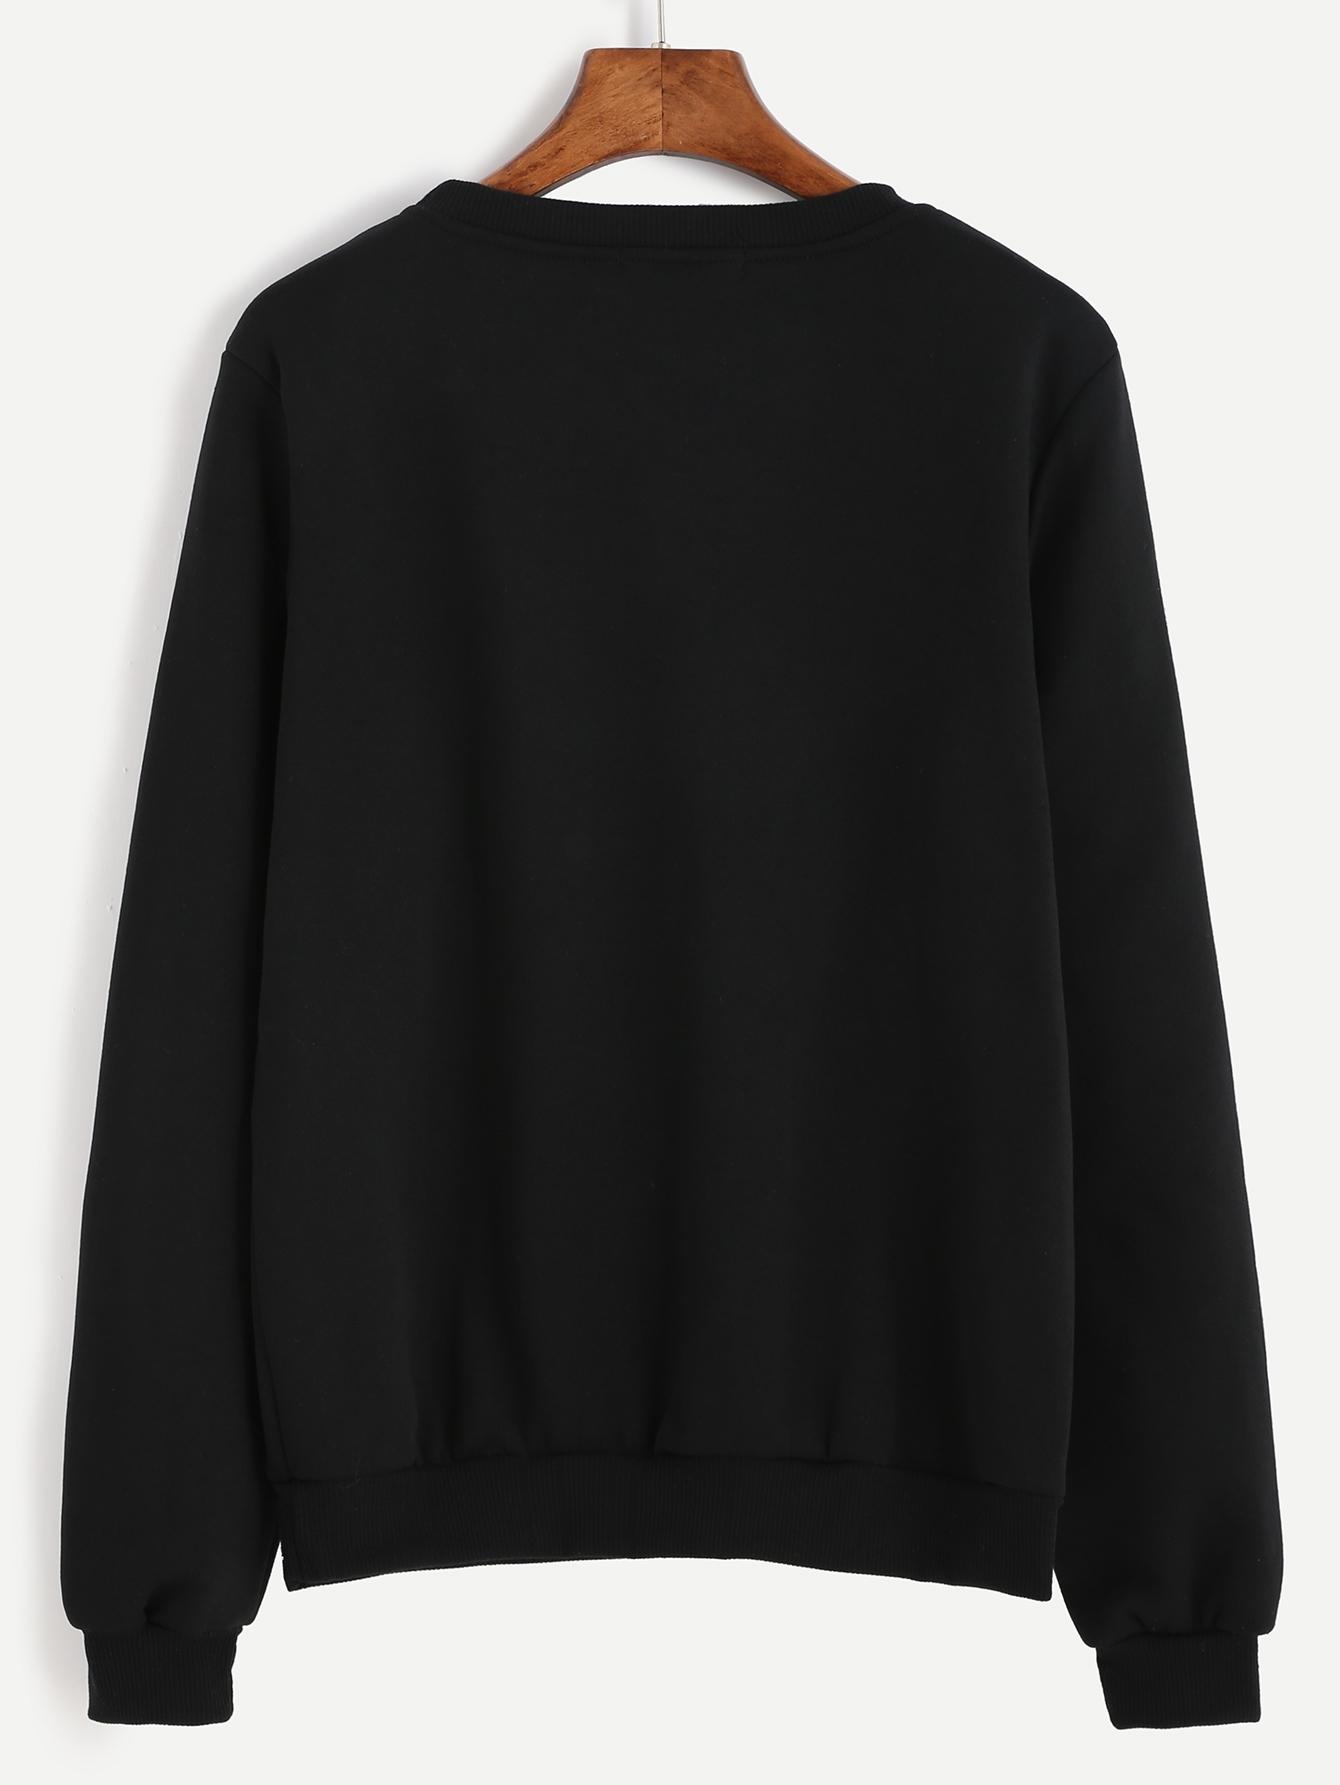 Crew Neck Letter Print Sweatshirt